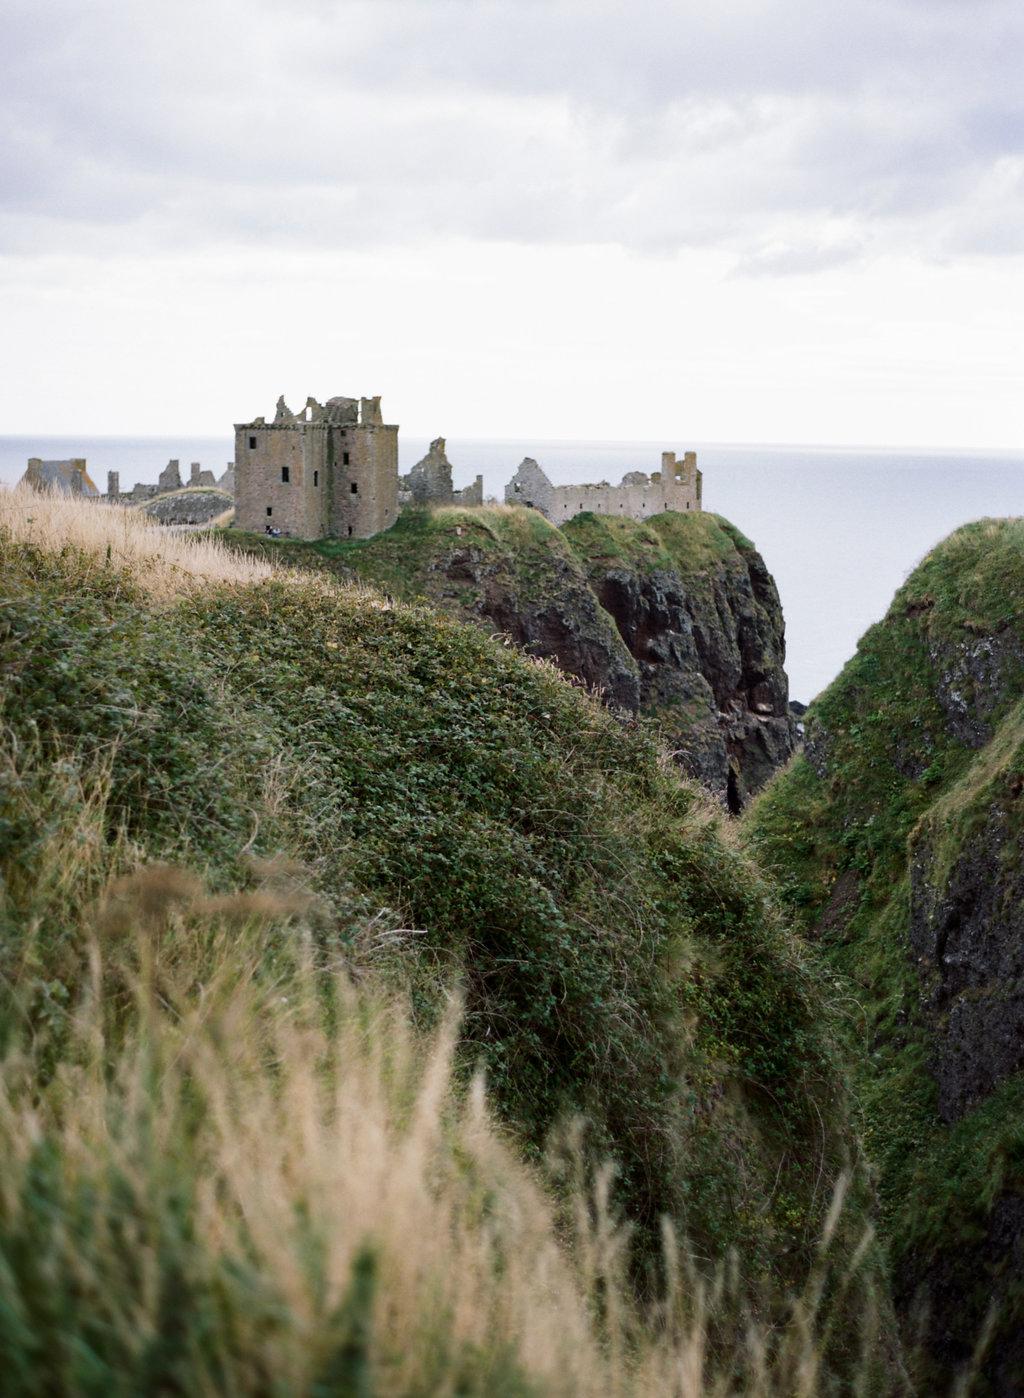 Scotland-Prewedding-highlands-castle-Engagment-Photos-Katie-Grant (118 of 139).jpg